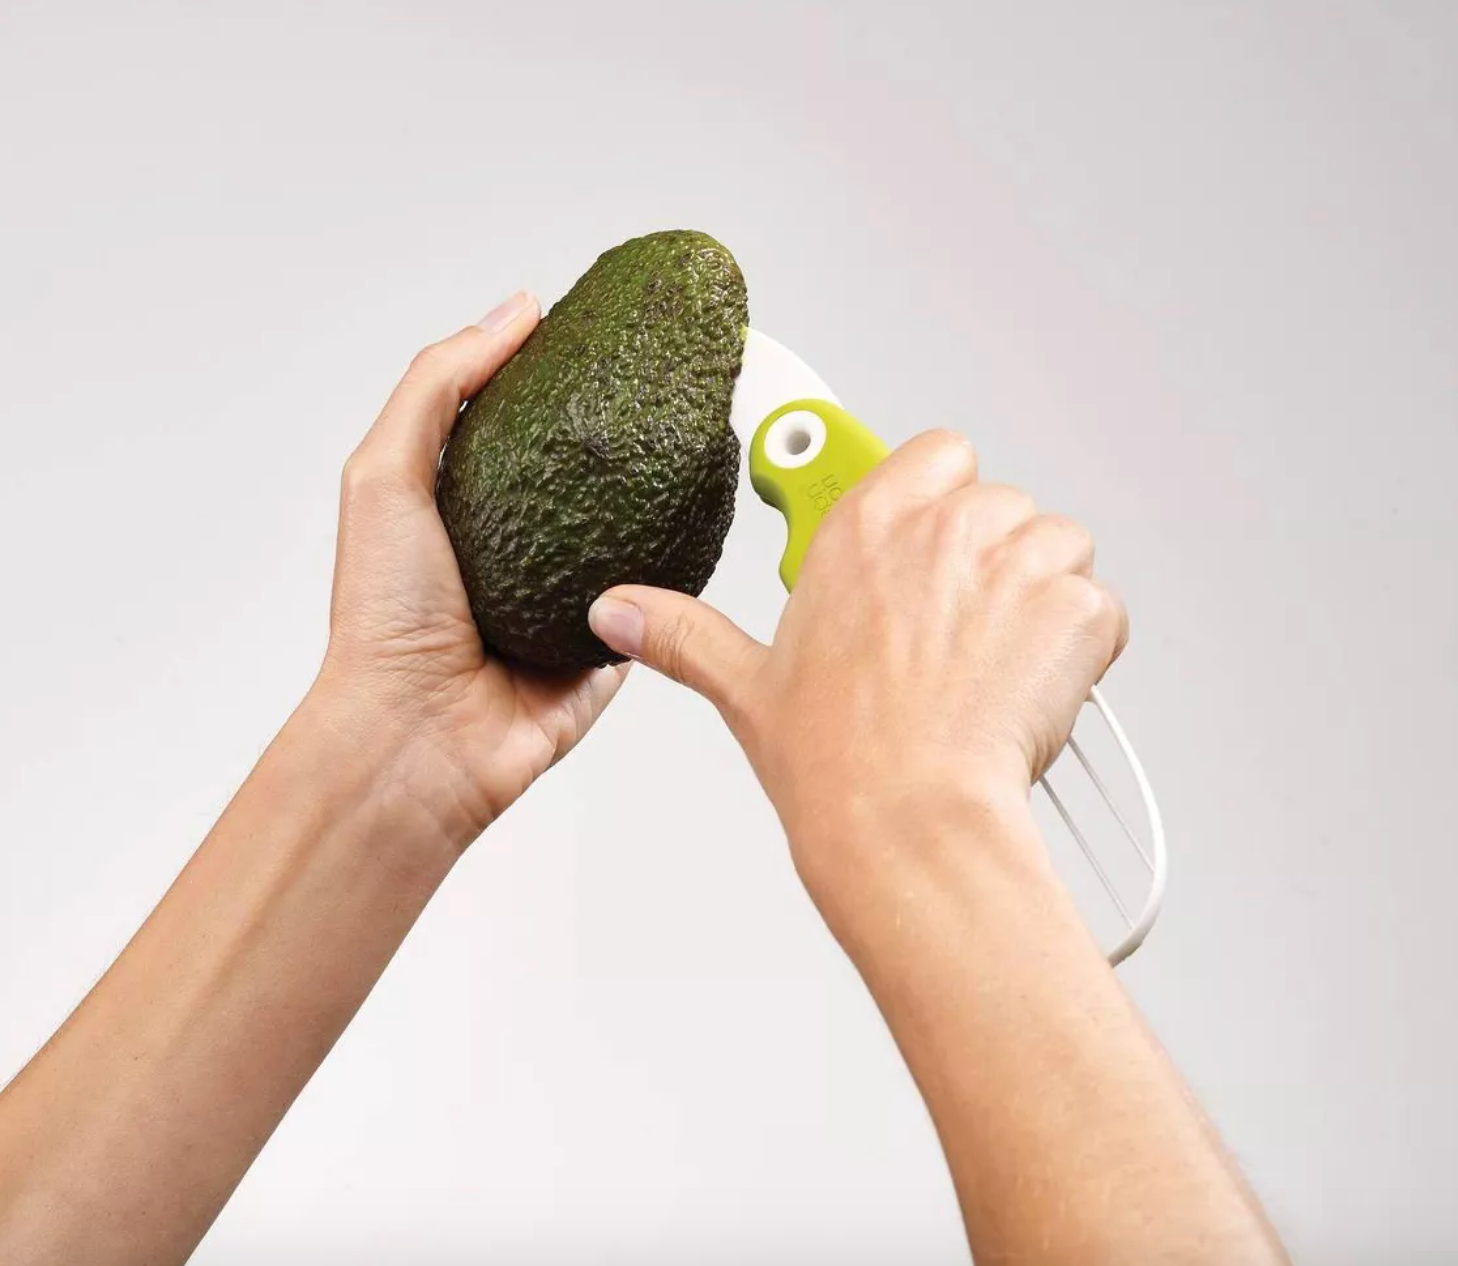 model cutting into avocado